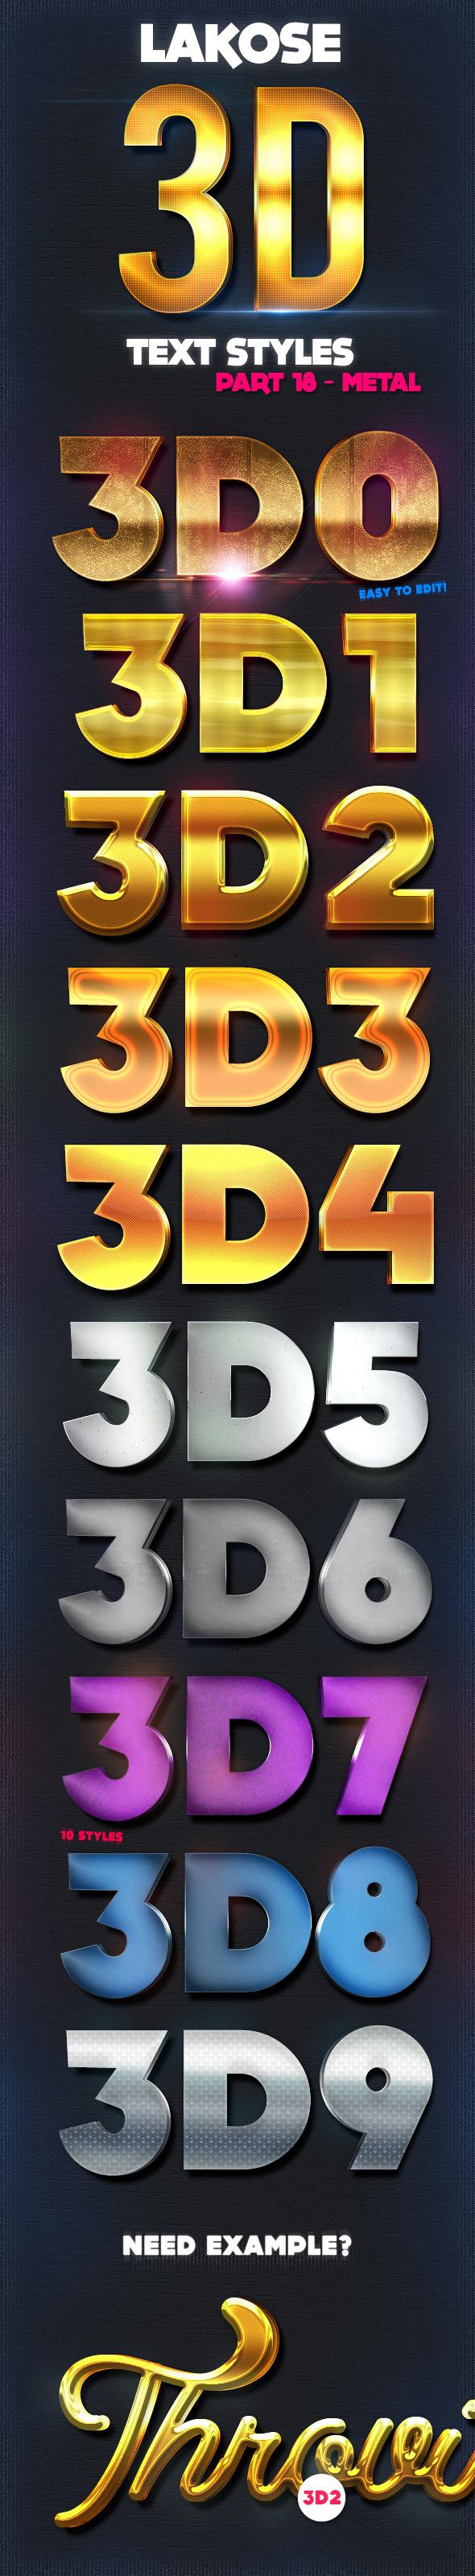 Lakose 3D Text Styles Part 18 - Text Effects Styles